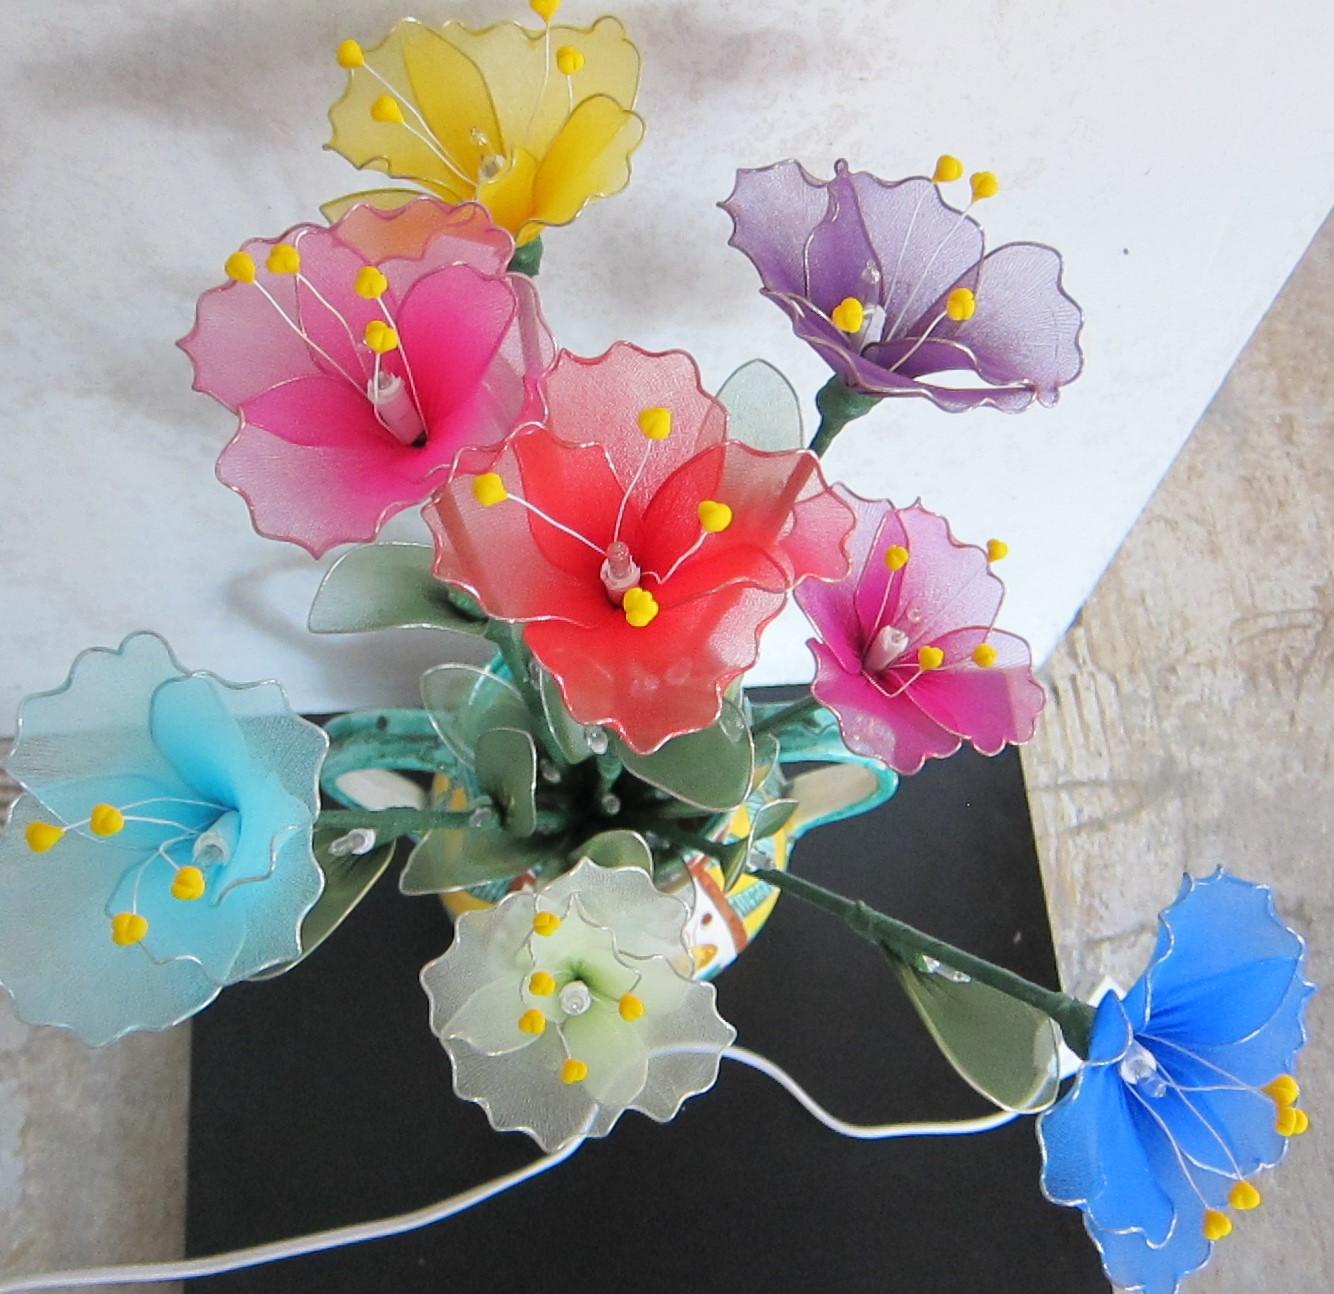 Flower Lights_4060